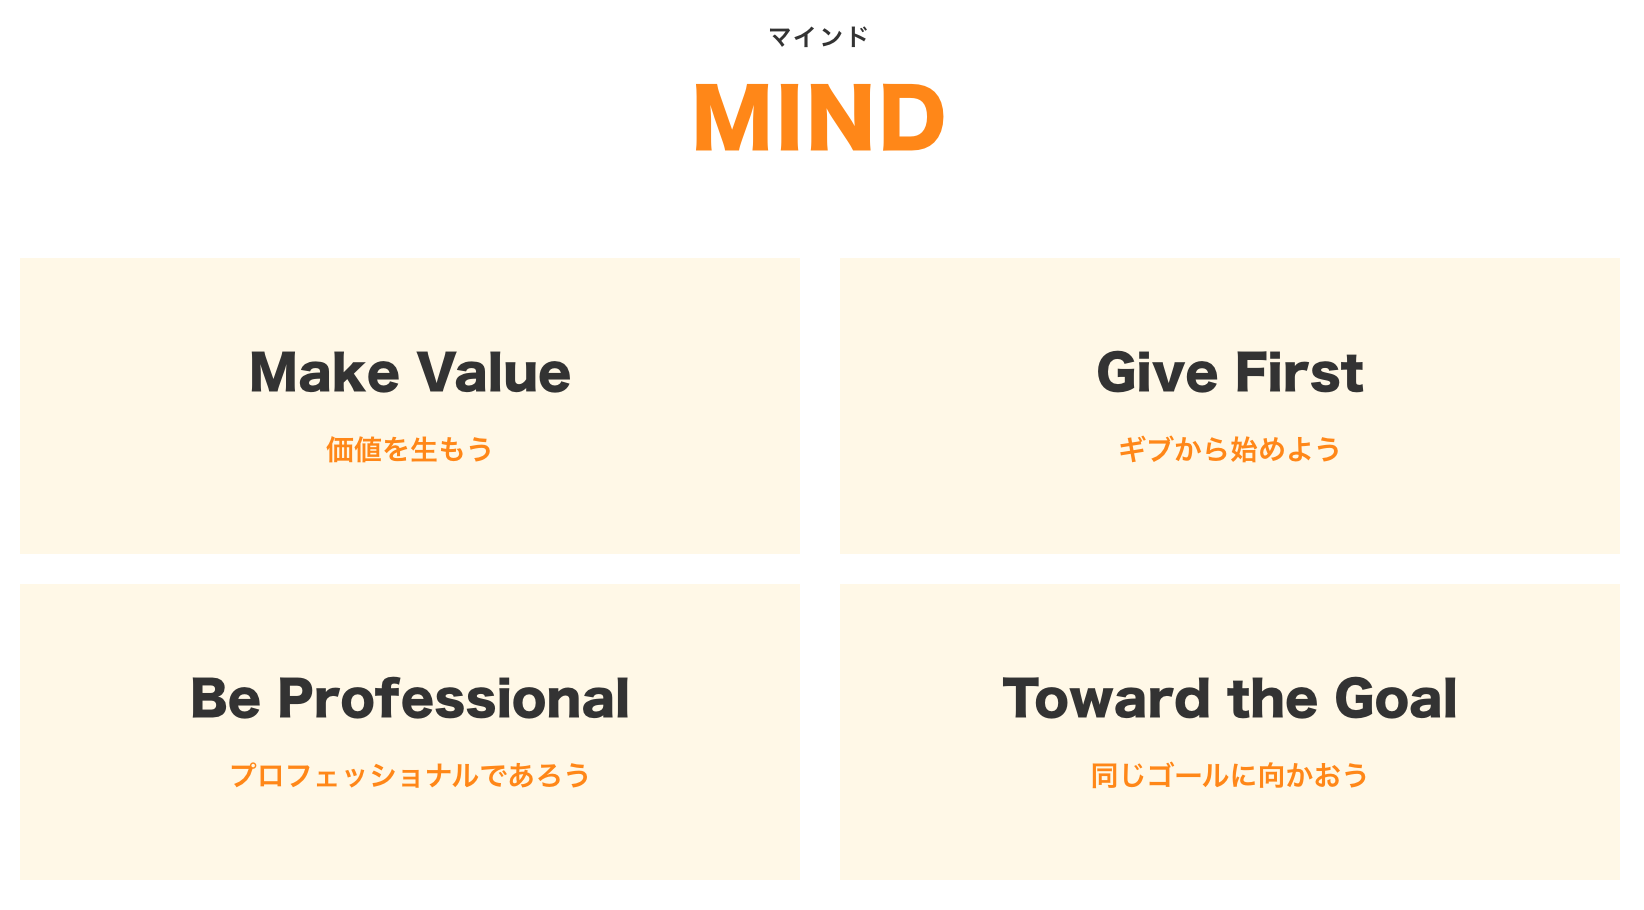 【株式会社Voicyの体験入社事例】Voicy Mind